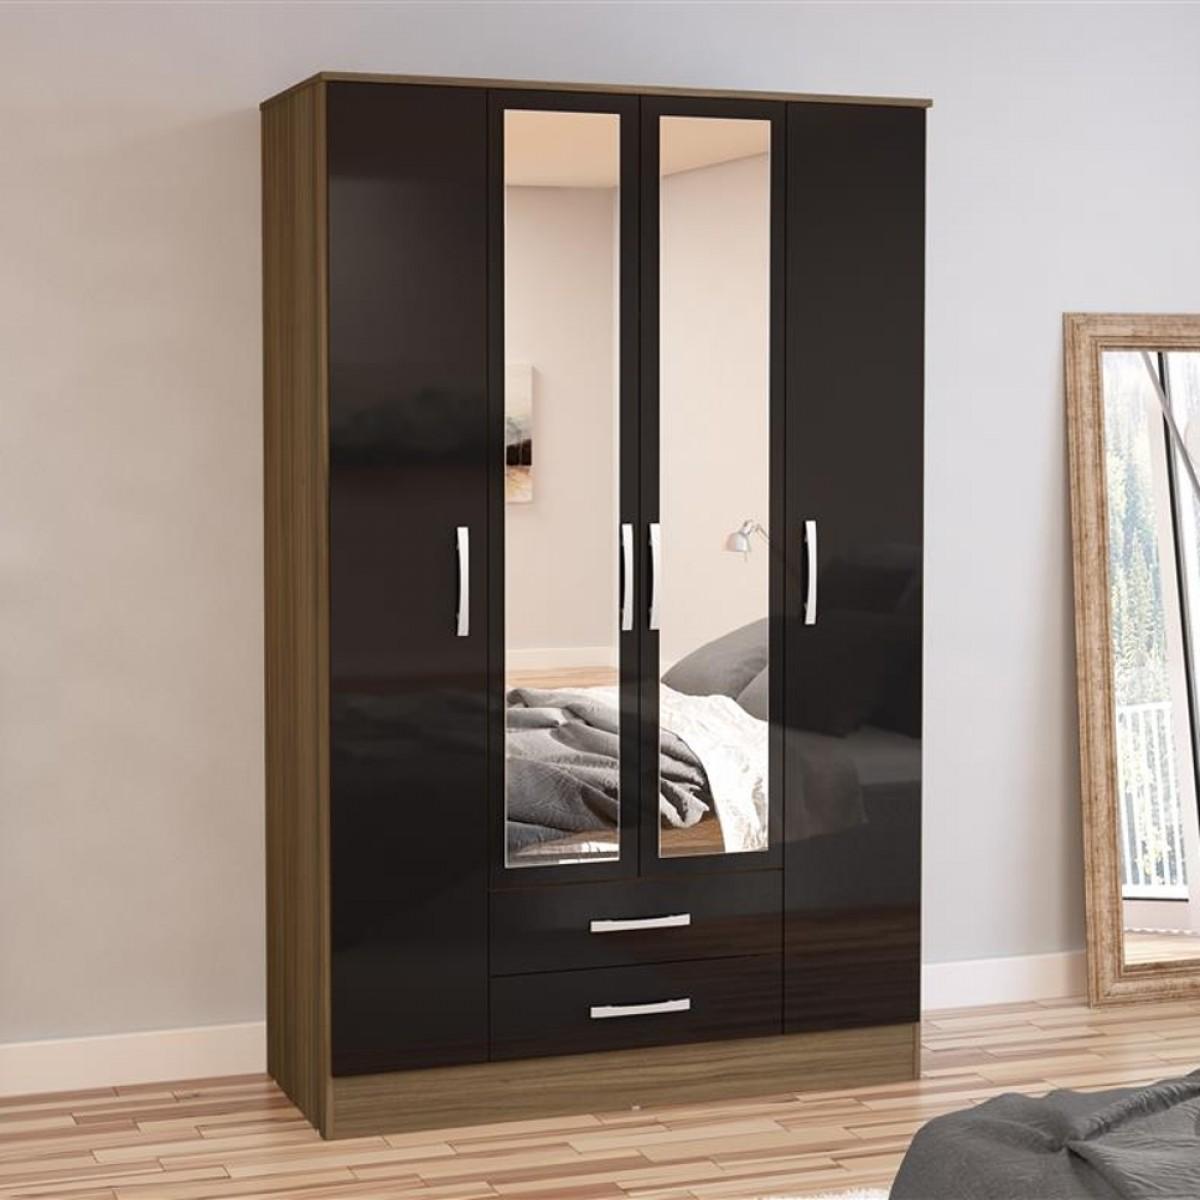 Lynx 4 Door Combination Mirrored Wardrobe Walnut and Black